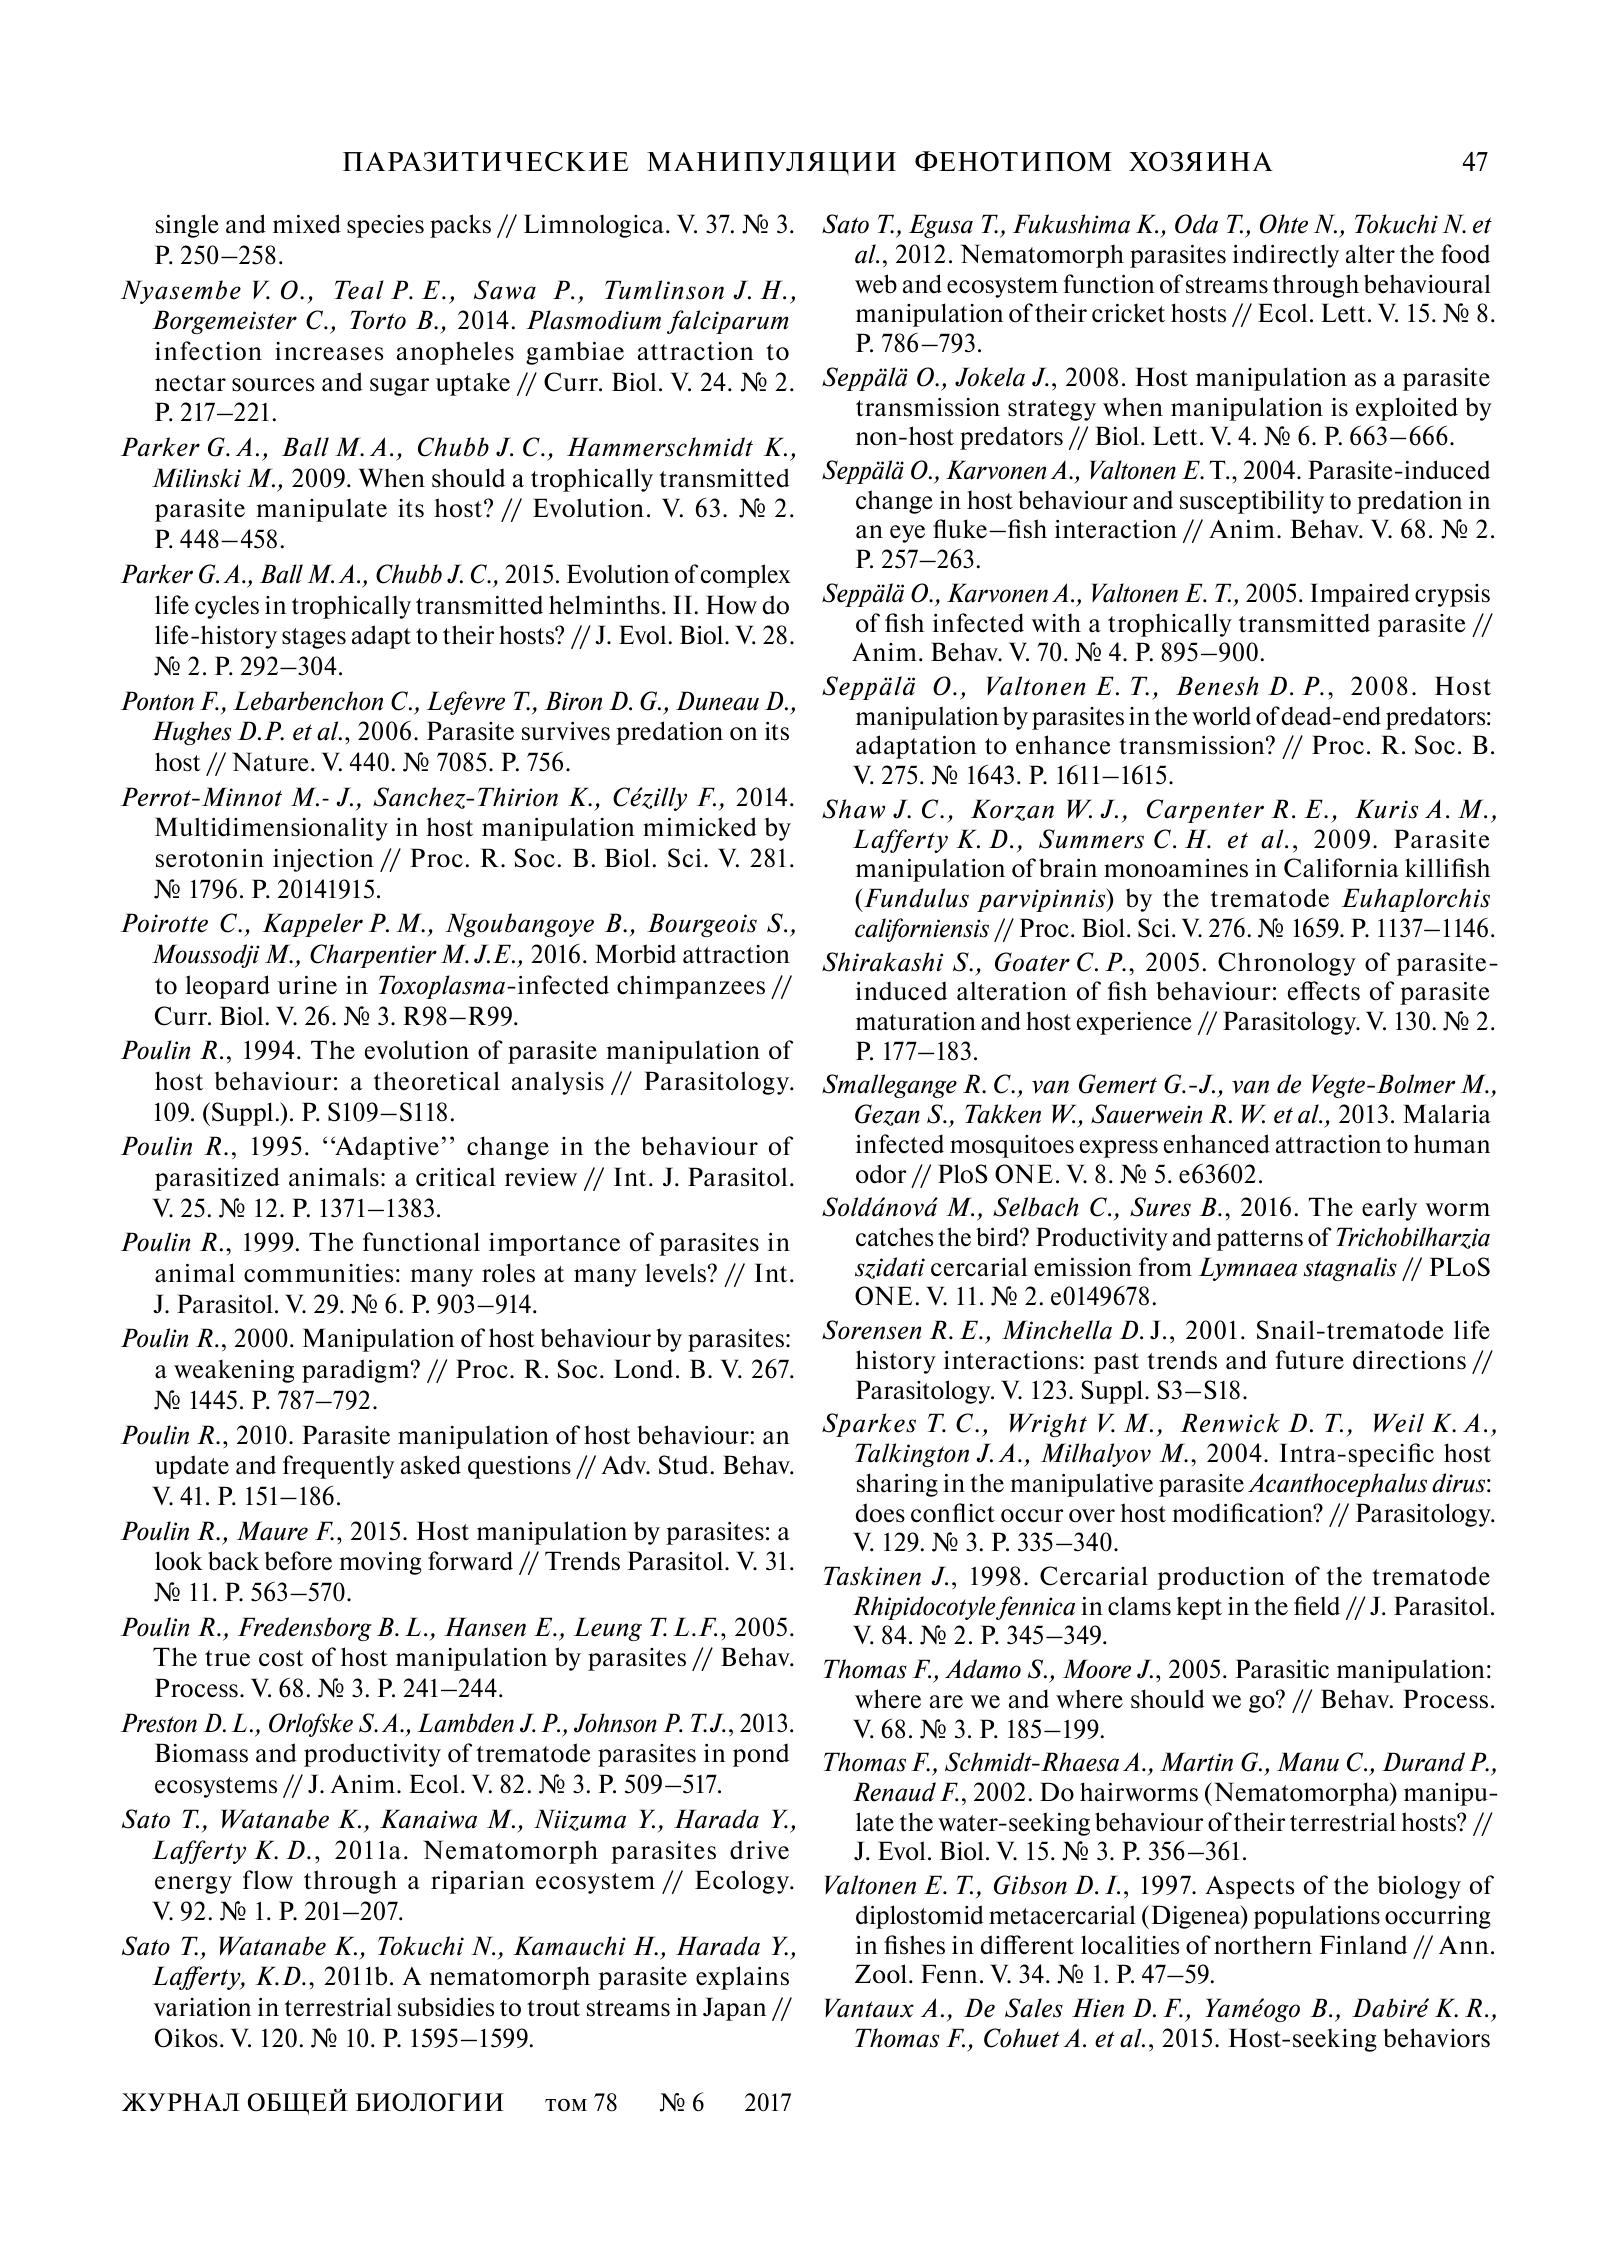 pdf_page_image-00032